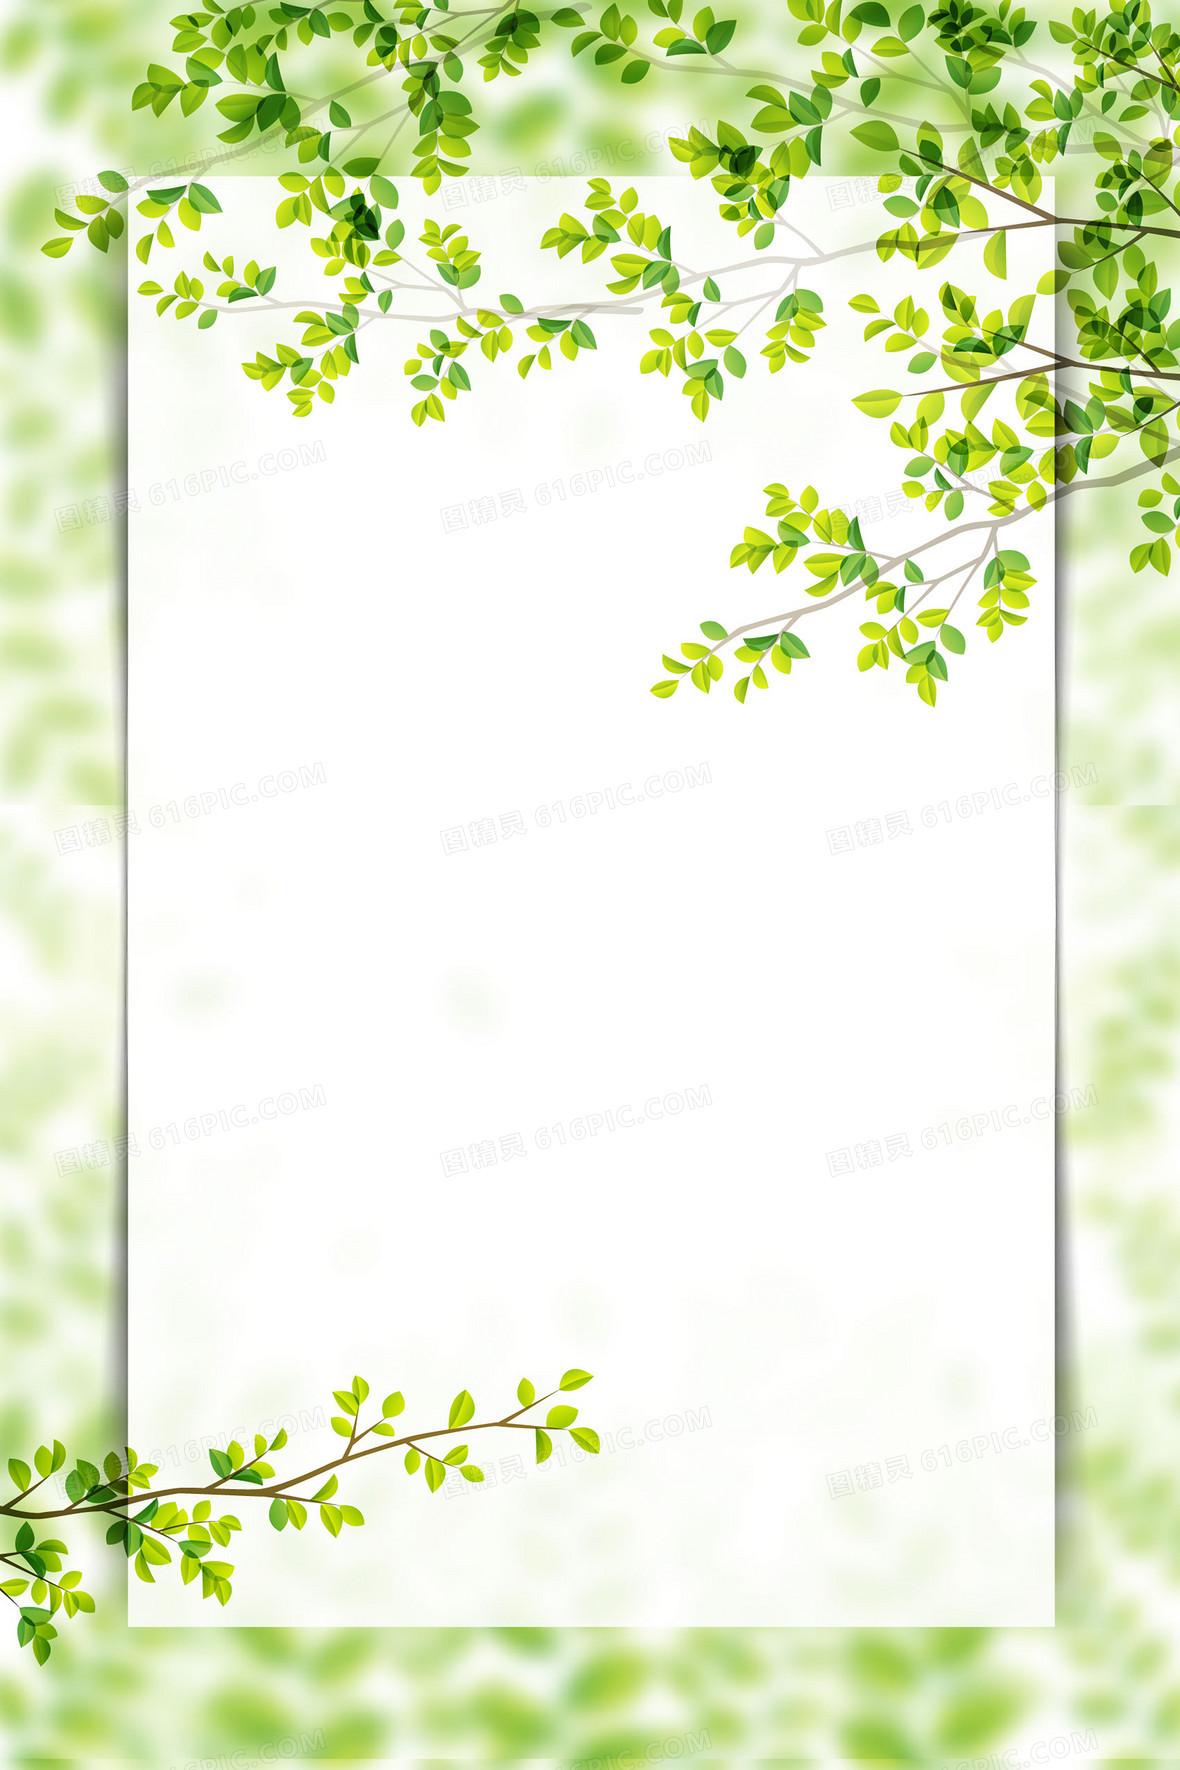 ppt 背景 背景图片 边框 模板 设计 矢量 矢量图 素材 相框 1180_1770